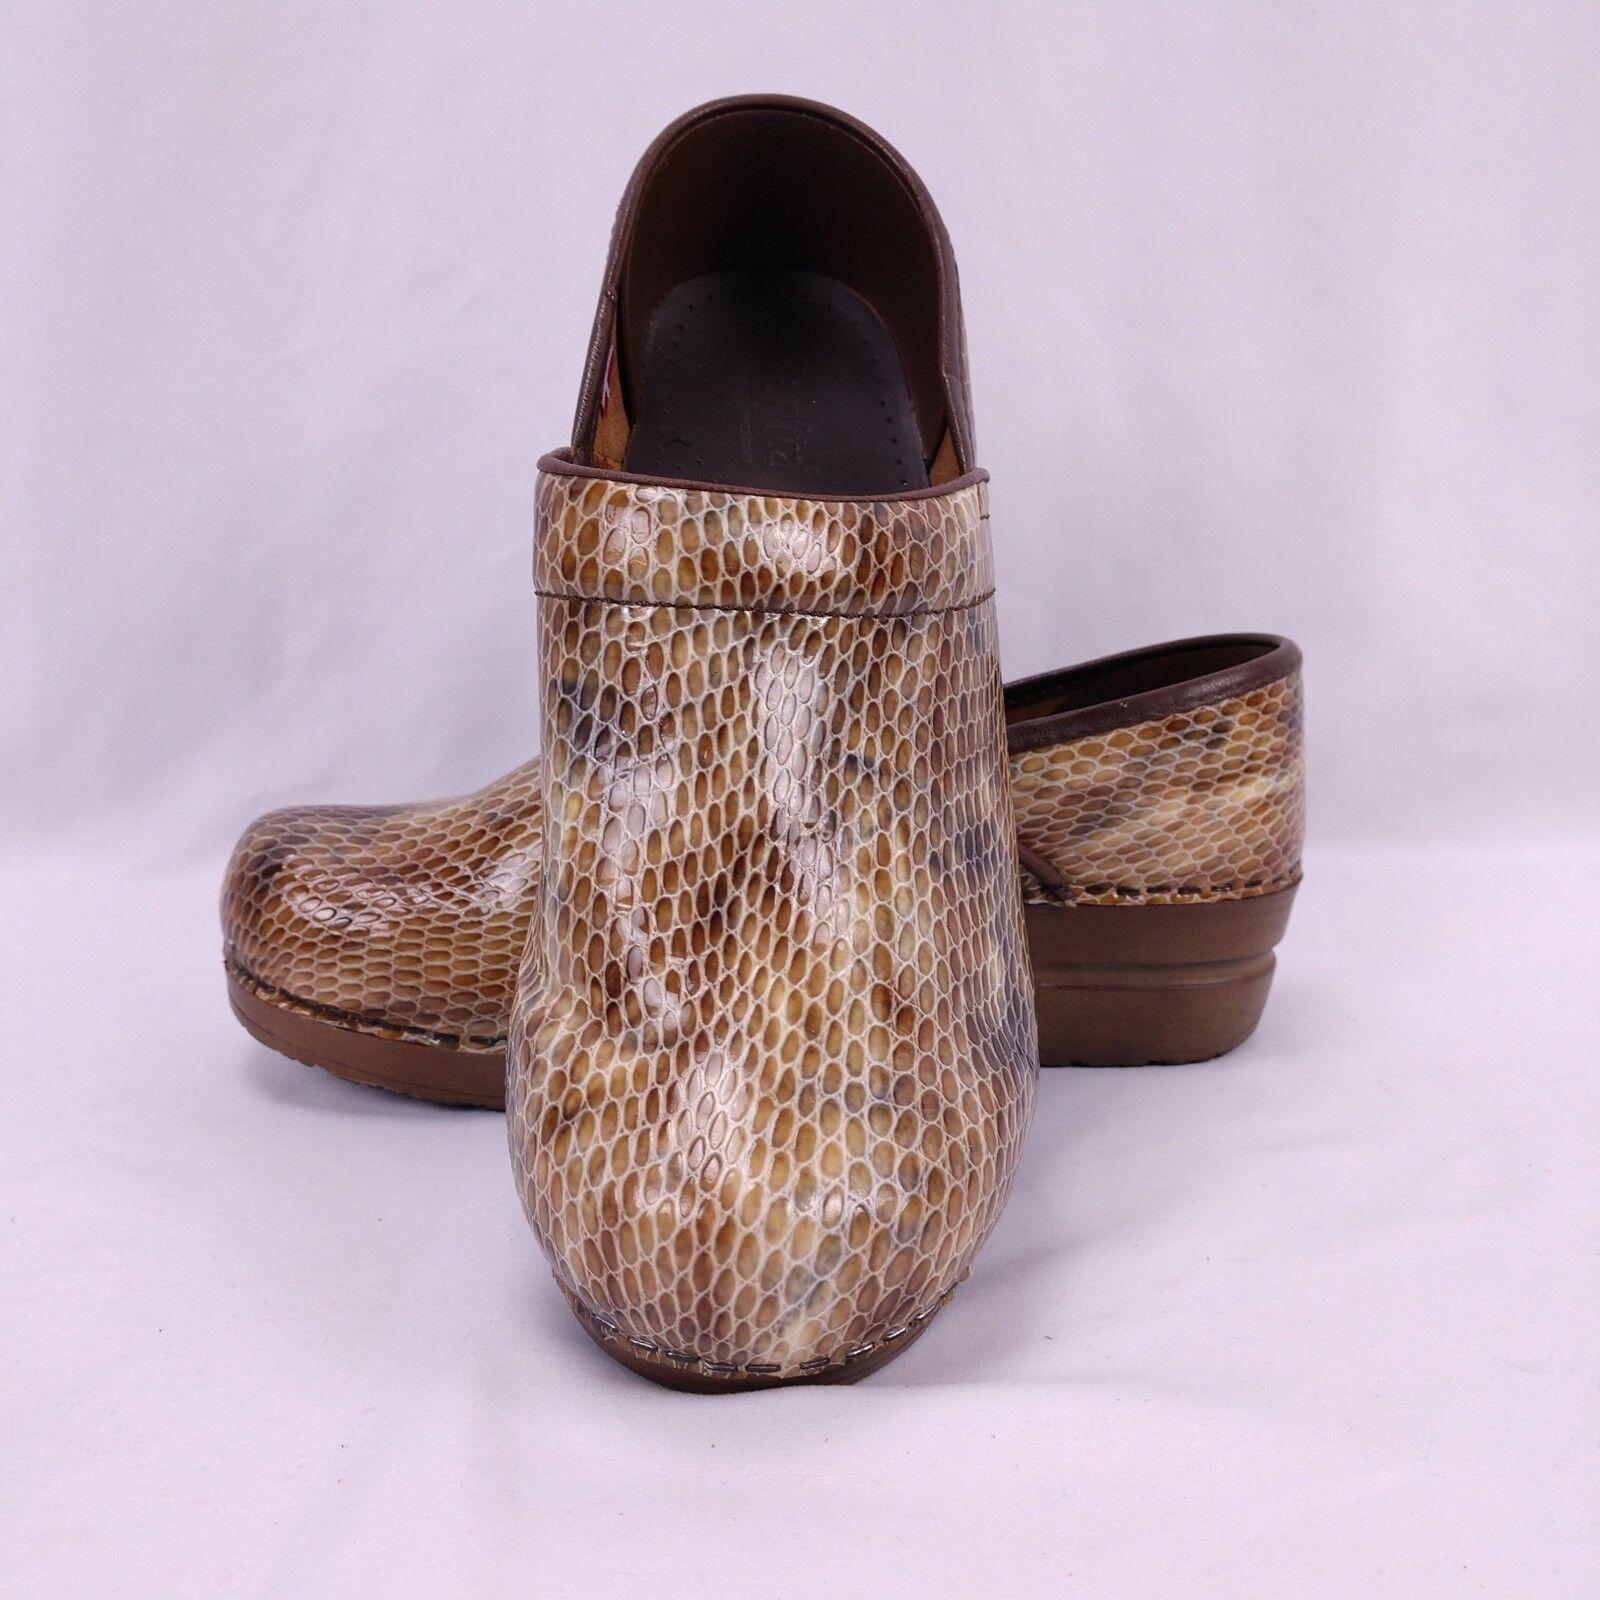 Sanita Clogs 39 braun Patent Leather Snakeskin Casual Work Nurse